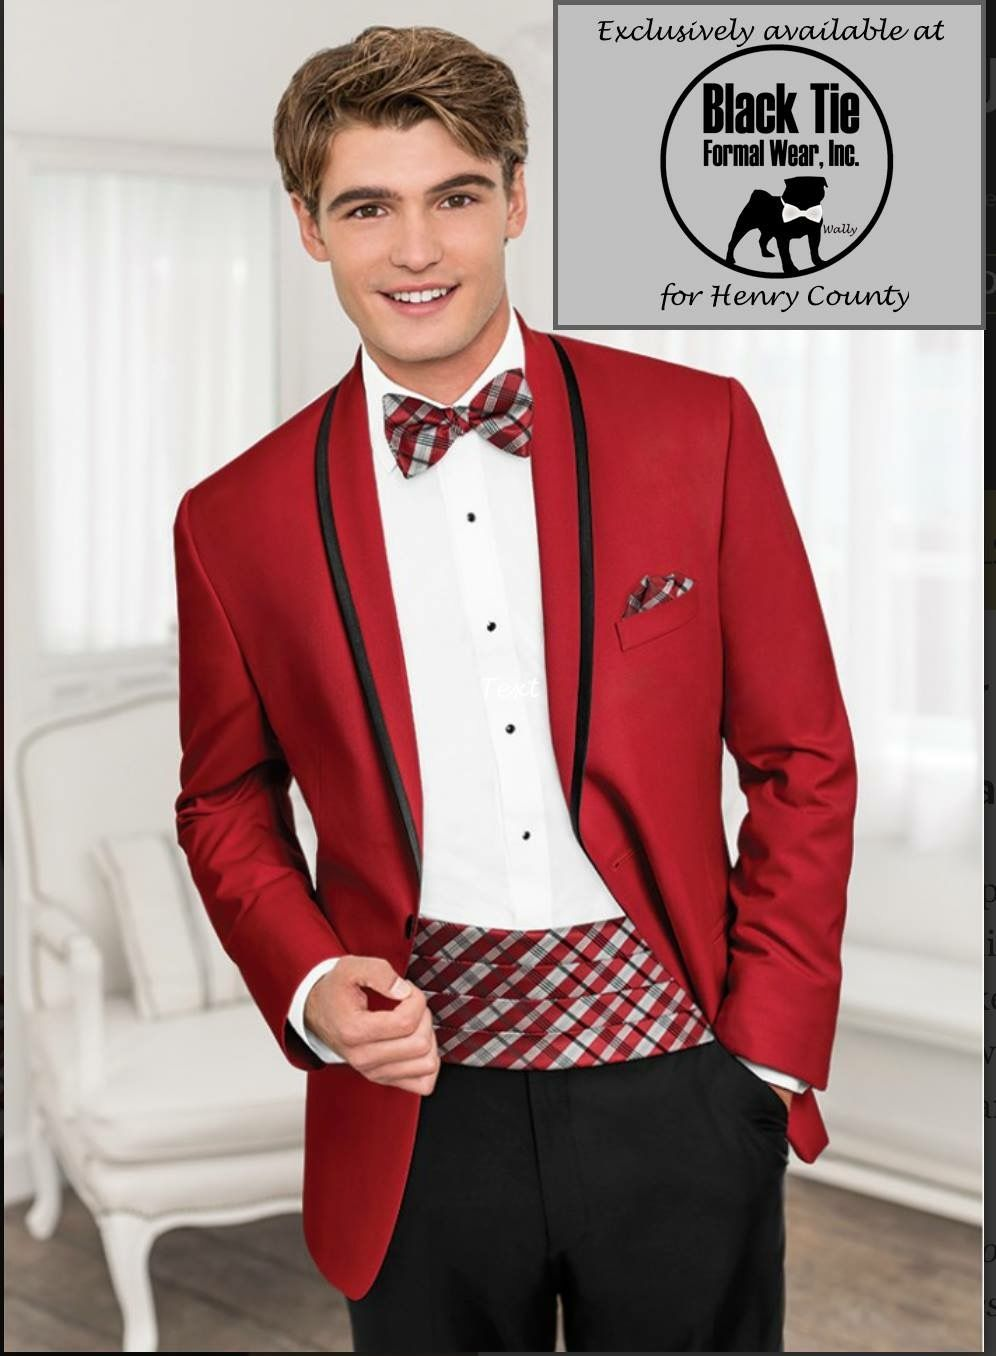 Pin by Rose Tuxedo on Prom 2019 Red tuxedo, Tuxedo